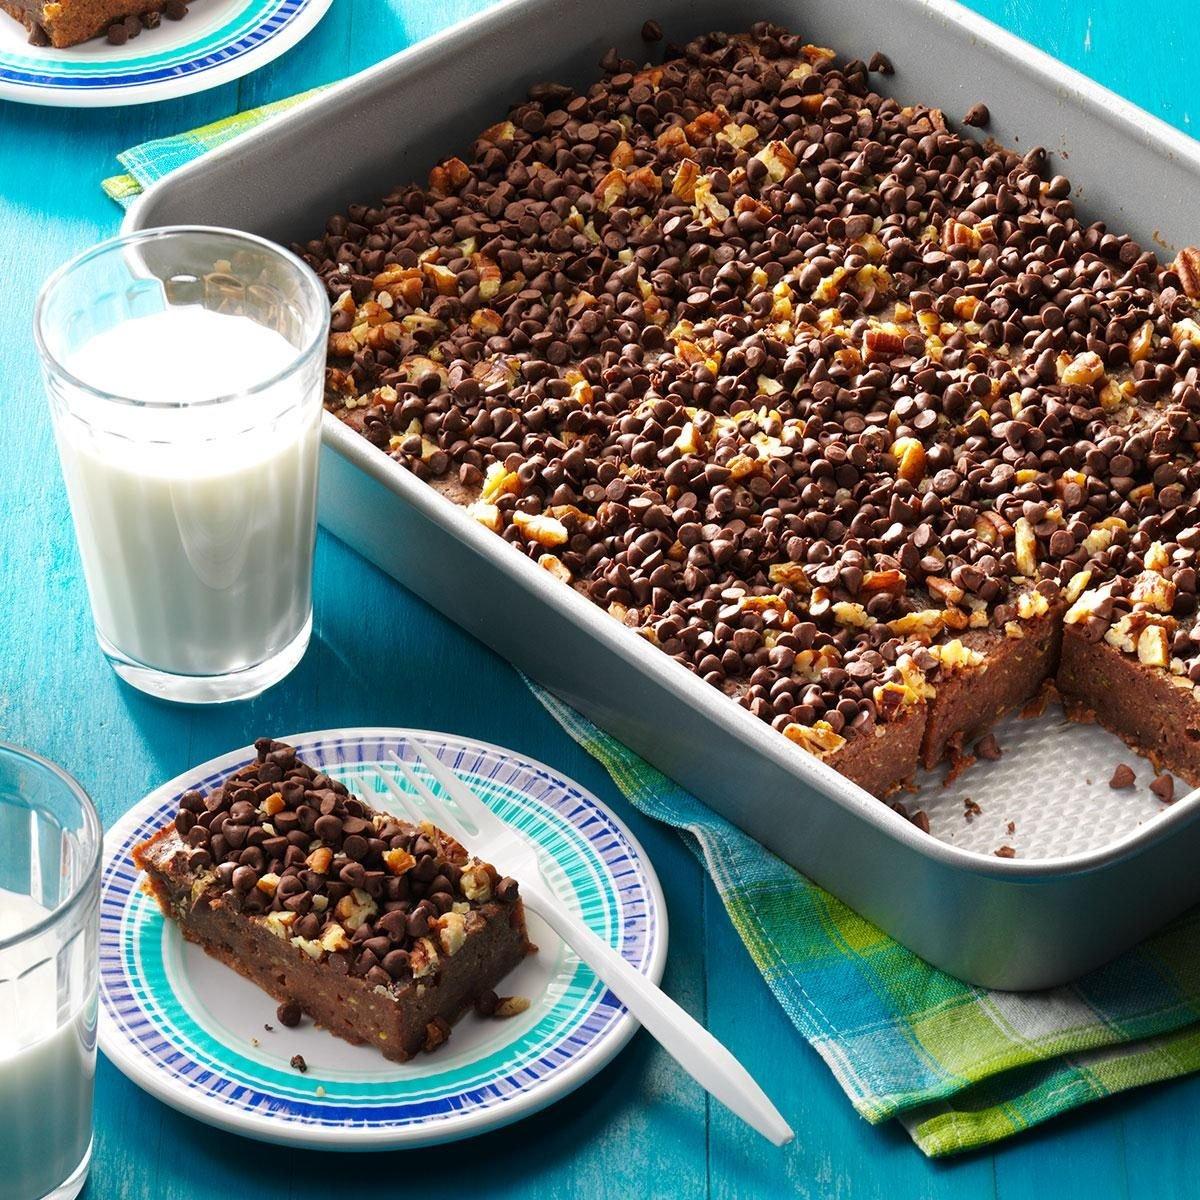 Zucchini: Yummy Zucchini Chocolate Cake